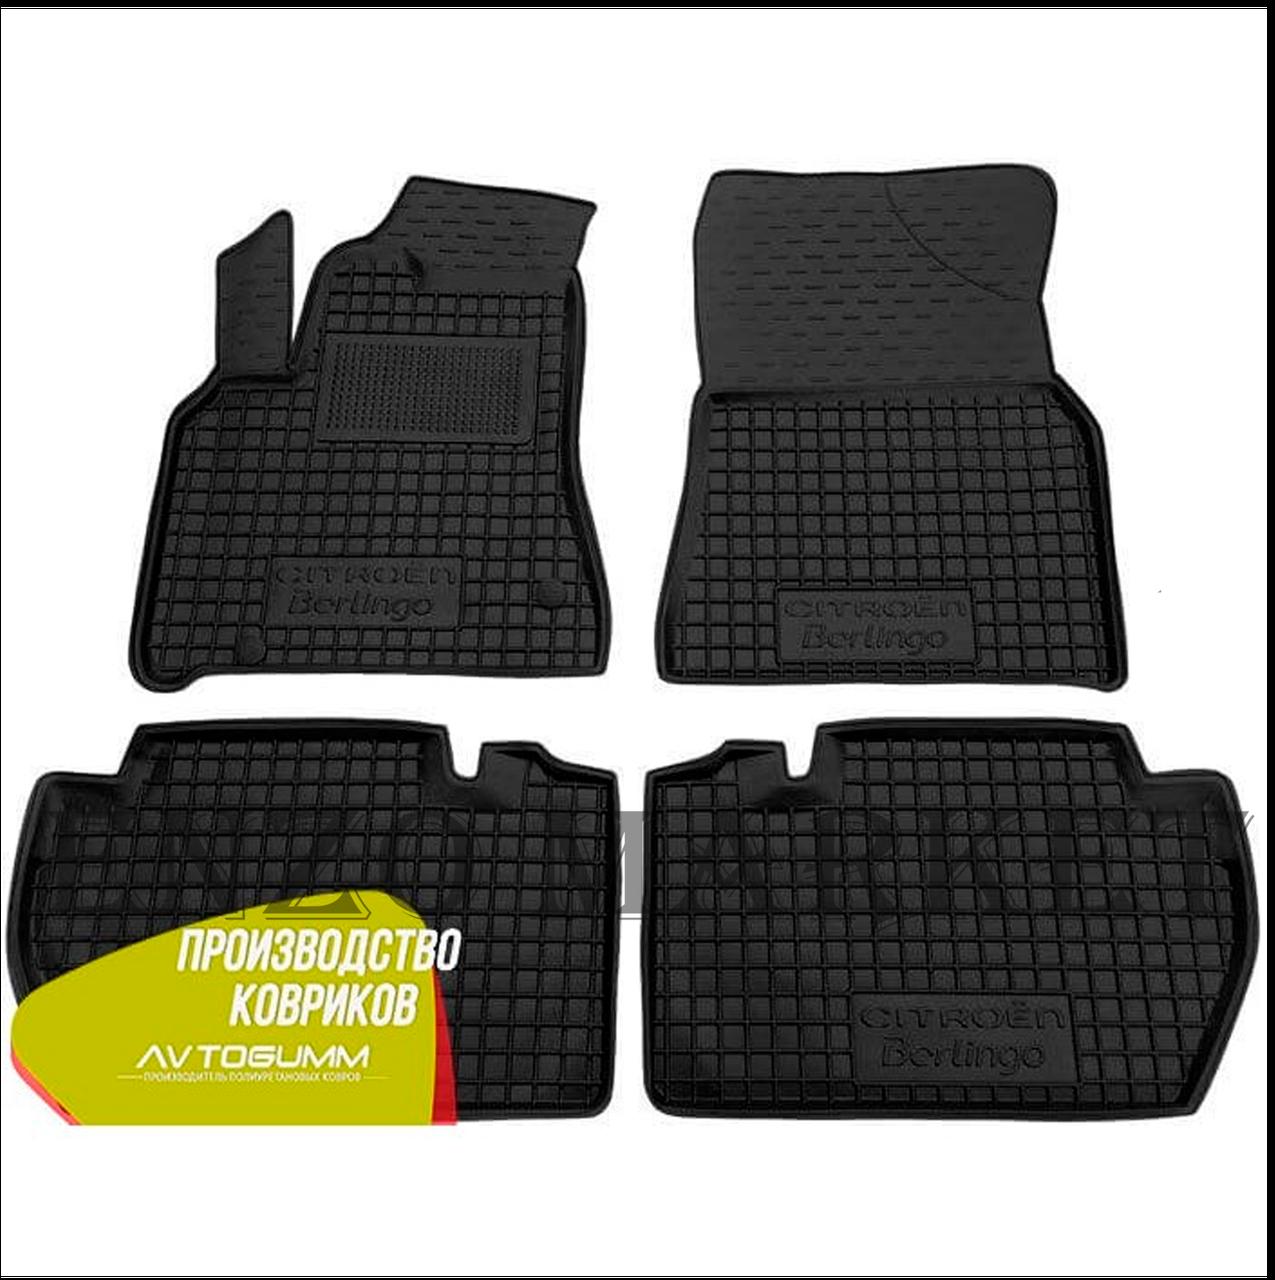 Автомобільні килимки в салон Citroen Berlingo 08-/Peugeot Partner 08- (Avto-Gumm)